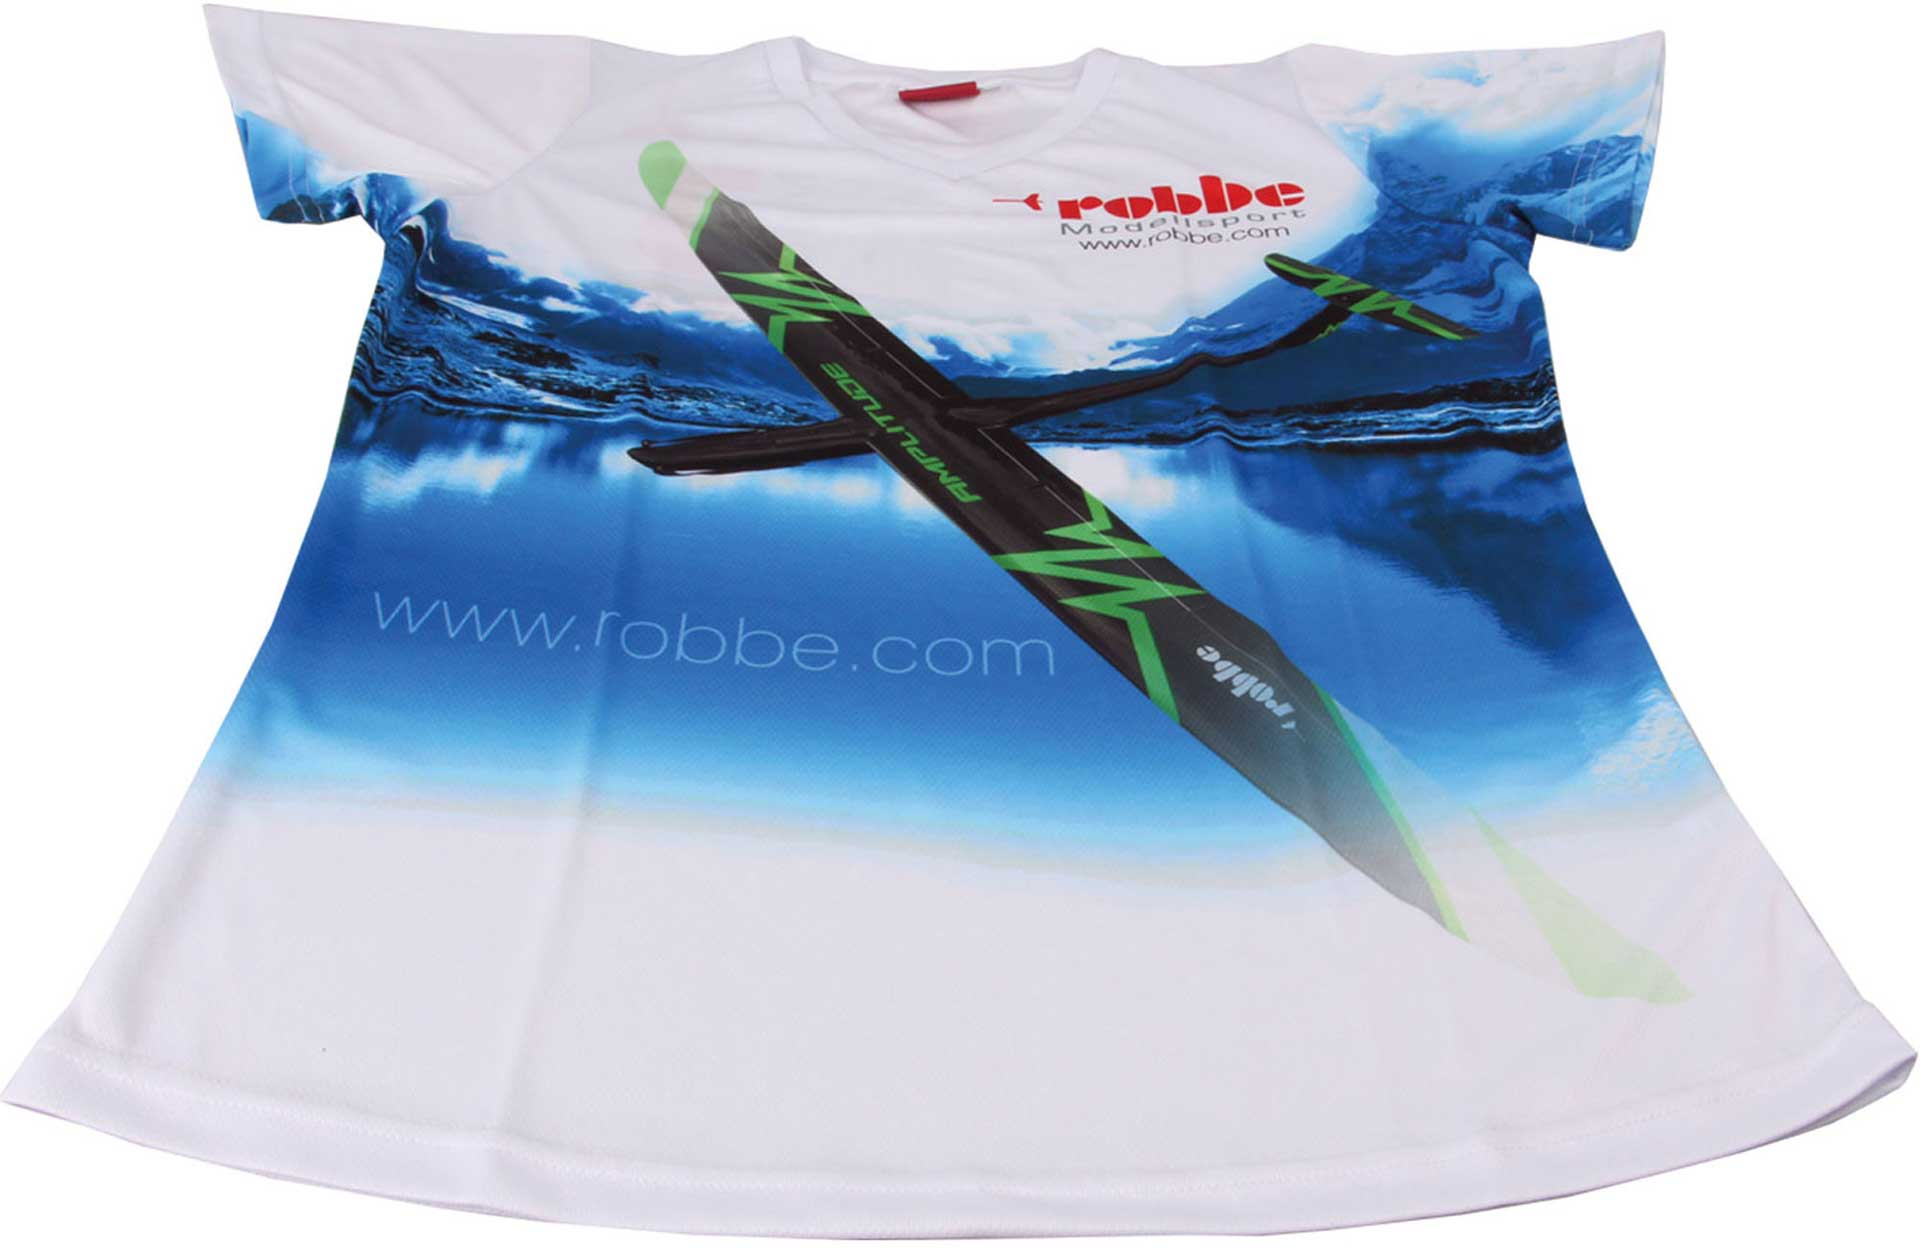 "Robbe Modellsport FUNKTIONS T-SHIRT ""AMPLITUDE"" ROBBE GRÖSSE XL"